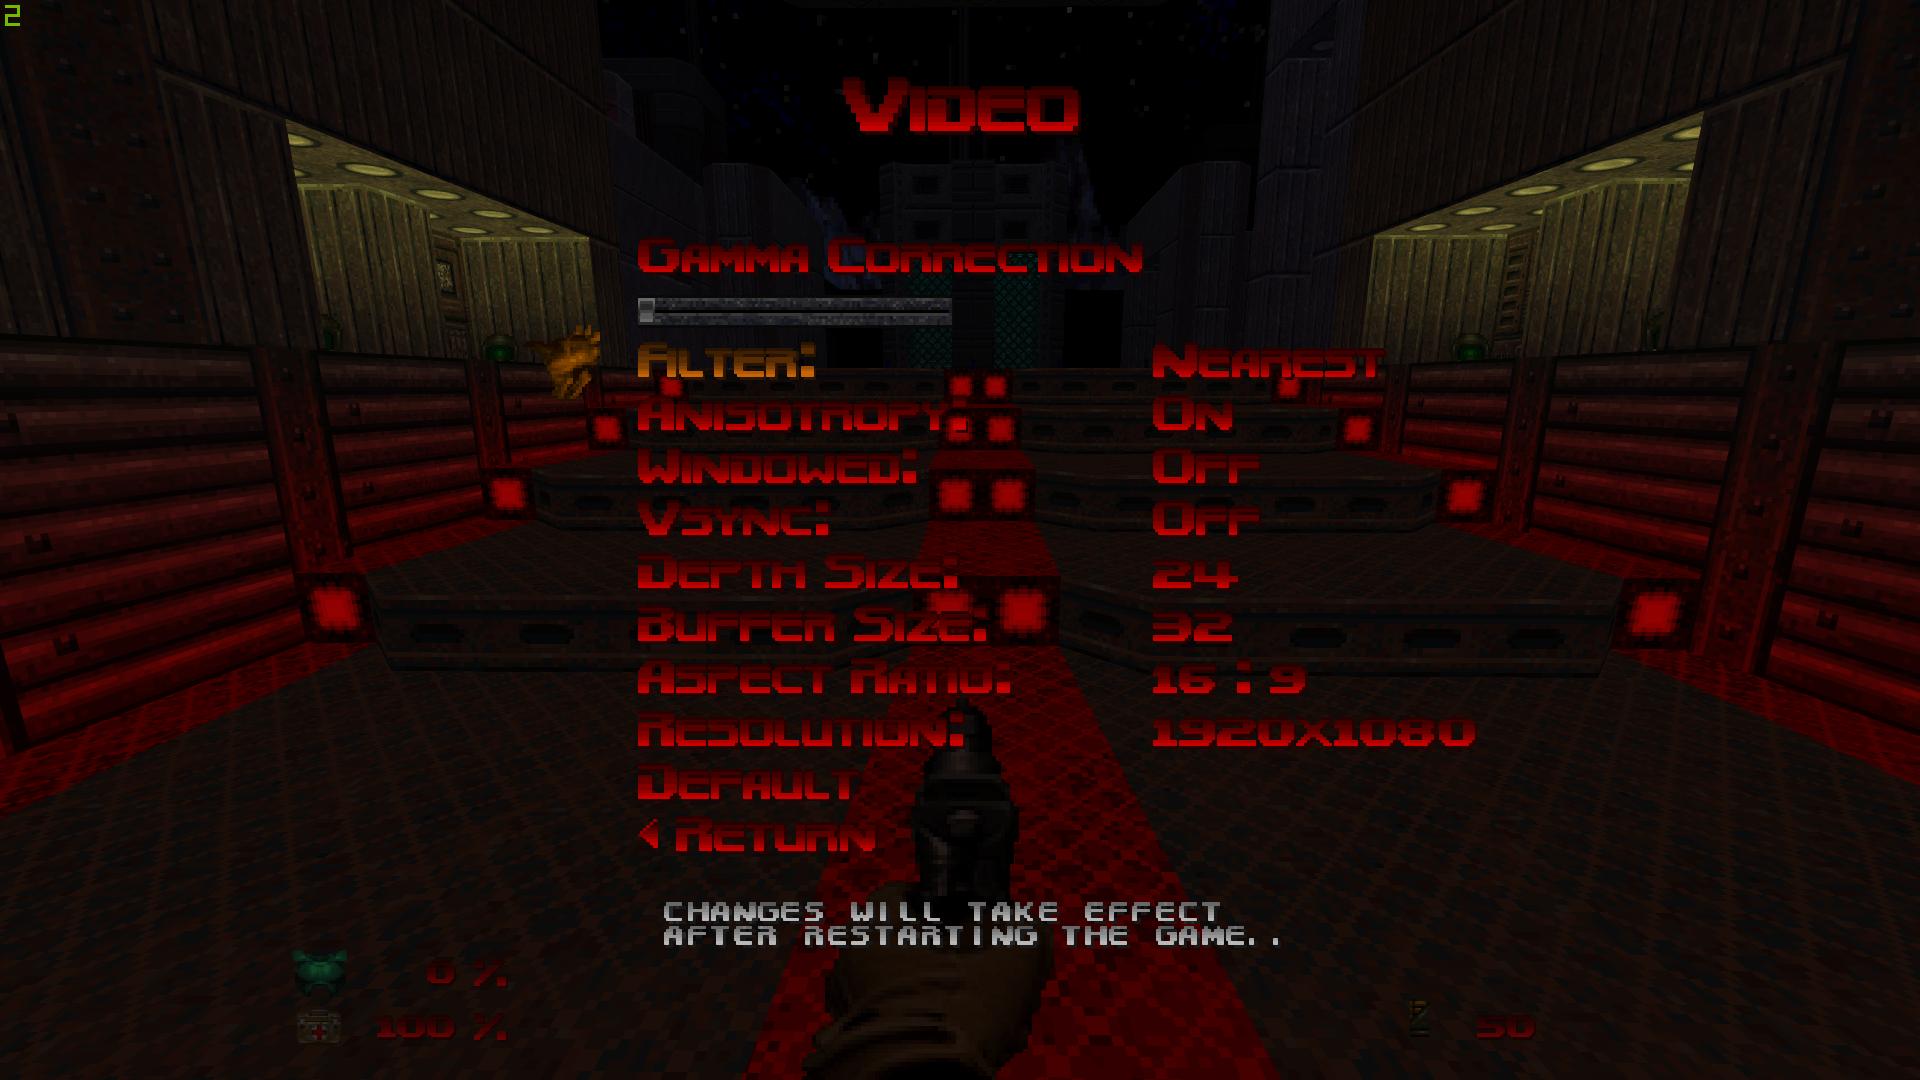 Doom_64_EX_4.png.d420580a4713a0ce1bcbf9ee43f3279f.png